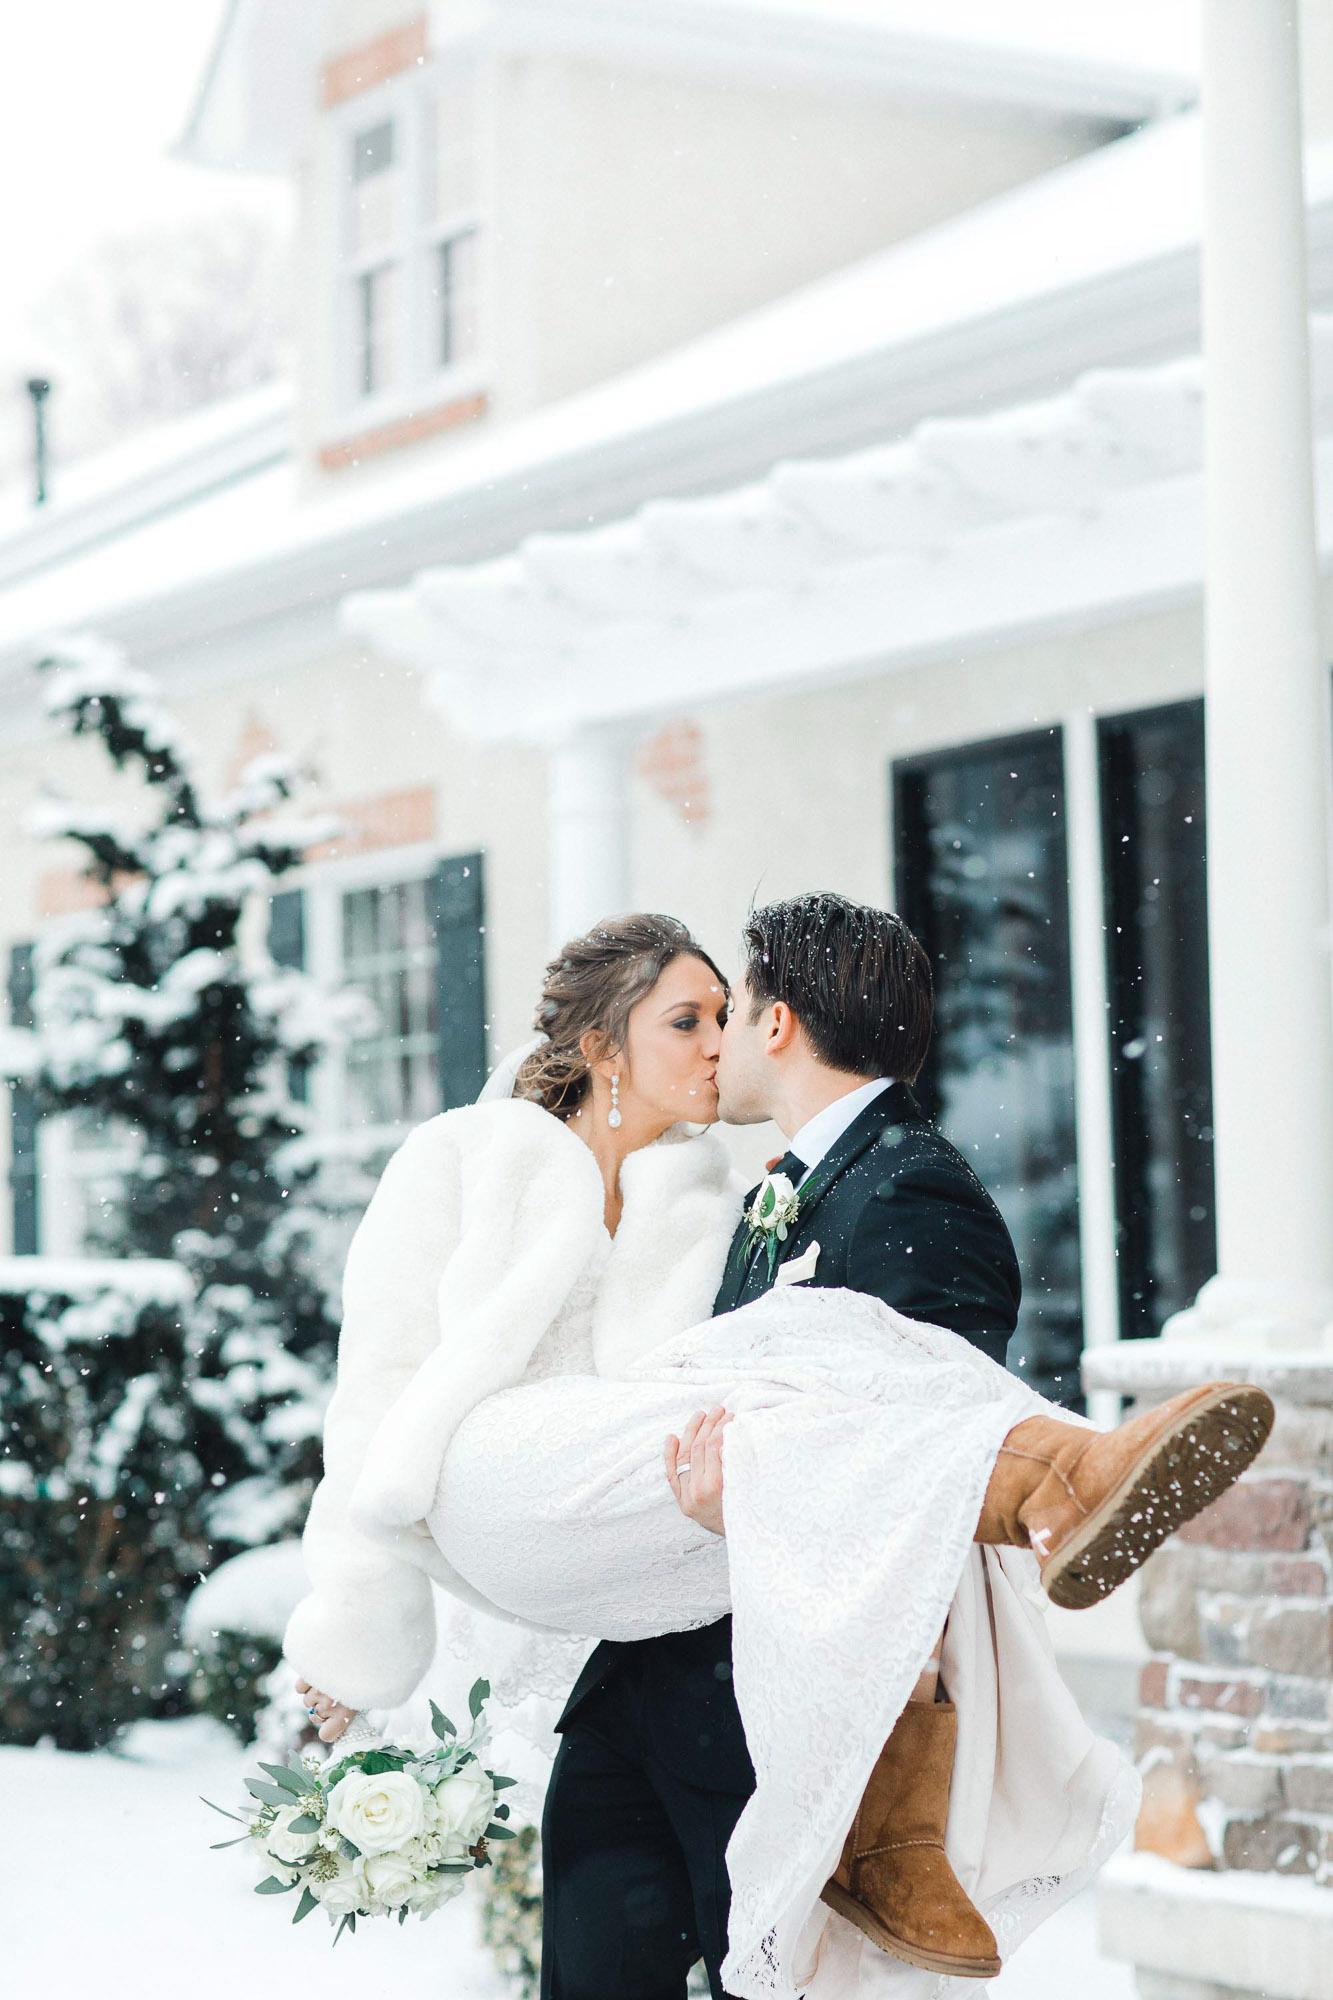 snowy-sand-springs-country-club-drums-pa-christmas-wedding-24590.jpg